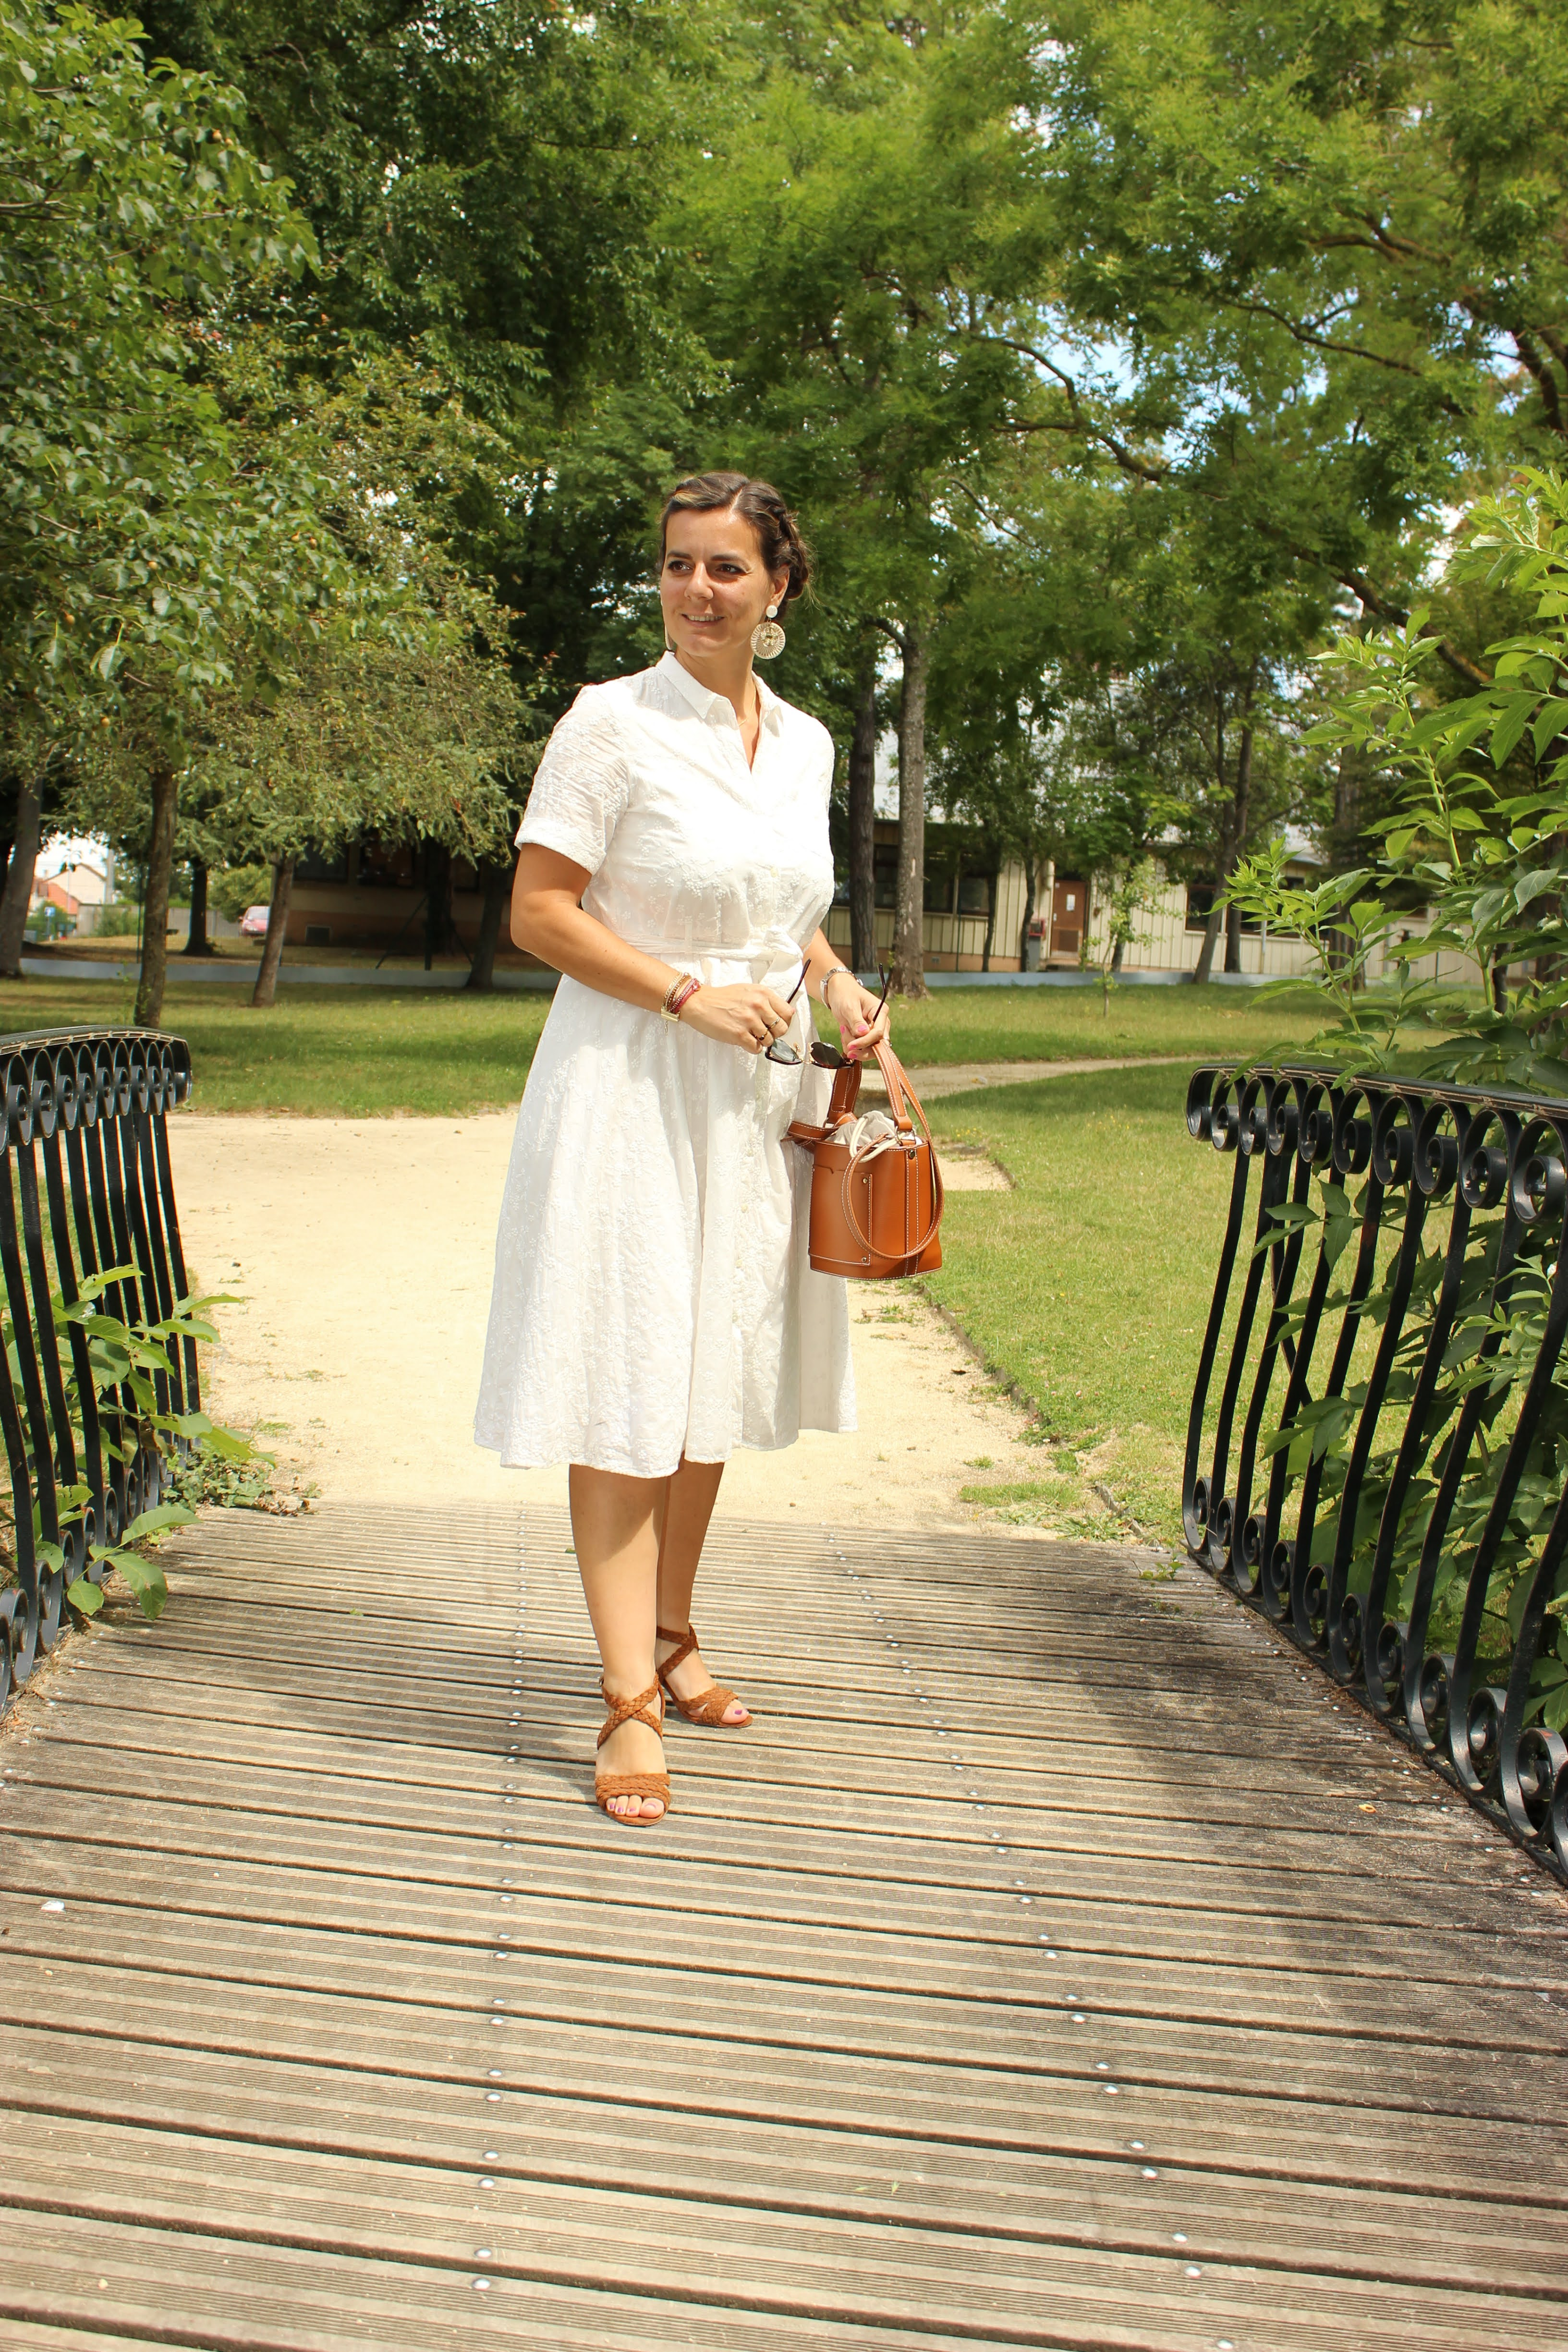 Robe blanche sézane, summer look, les petites bulles de ma vie